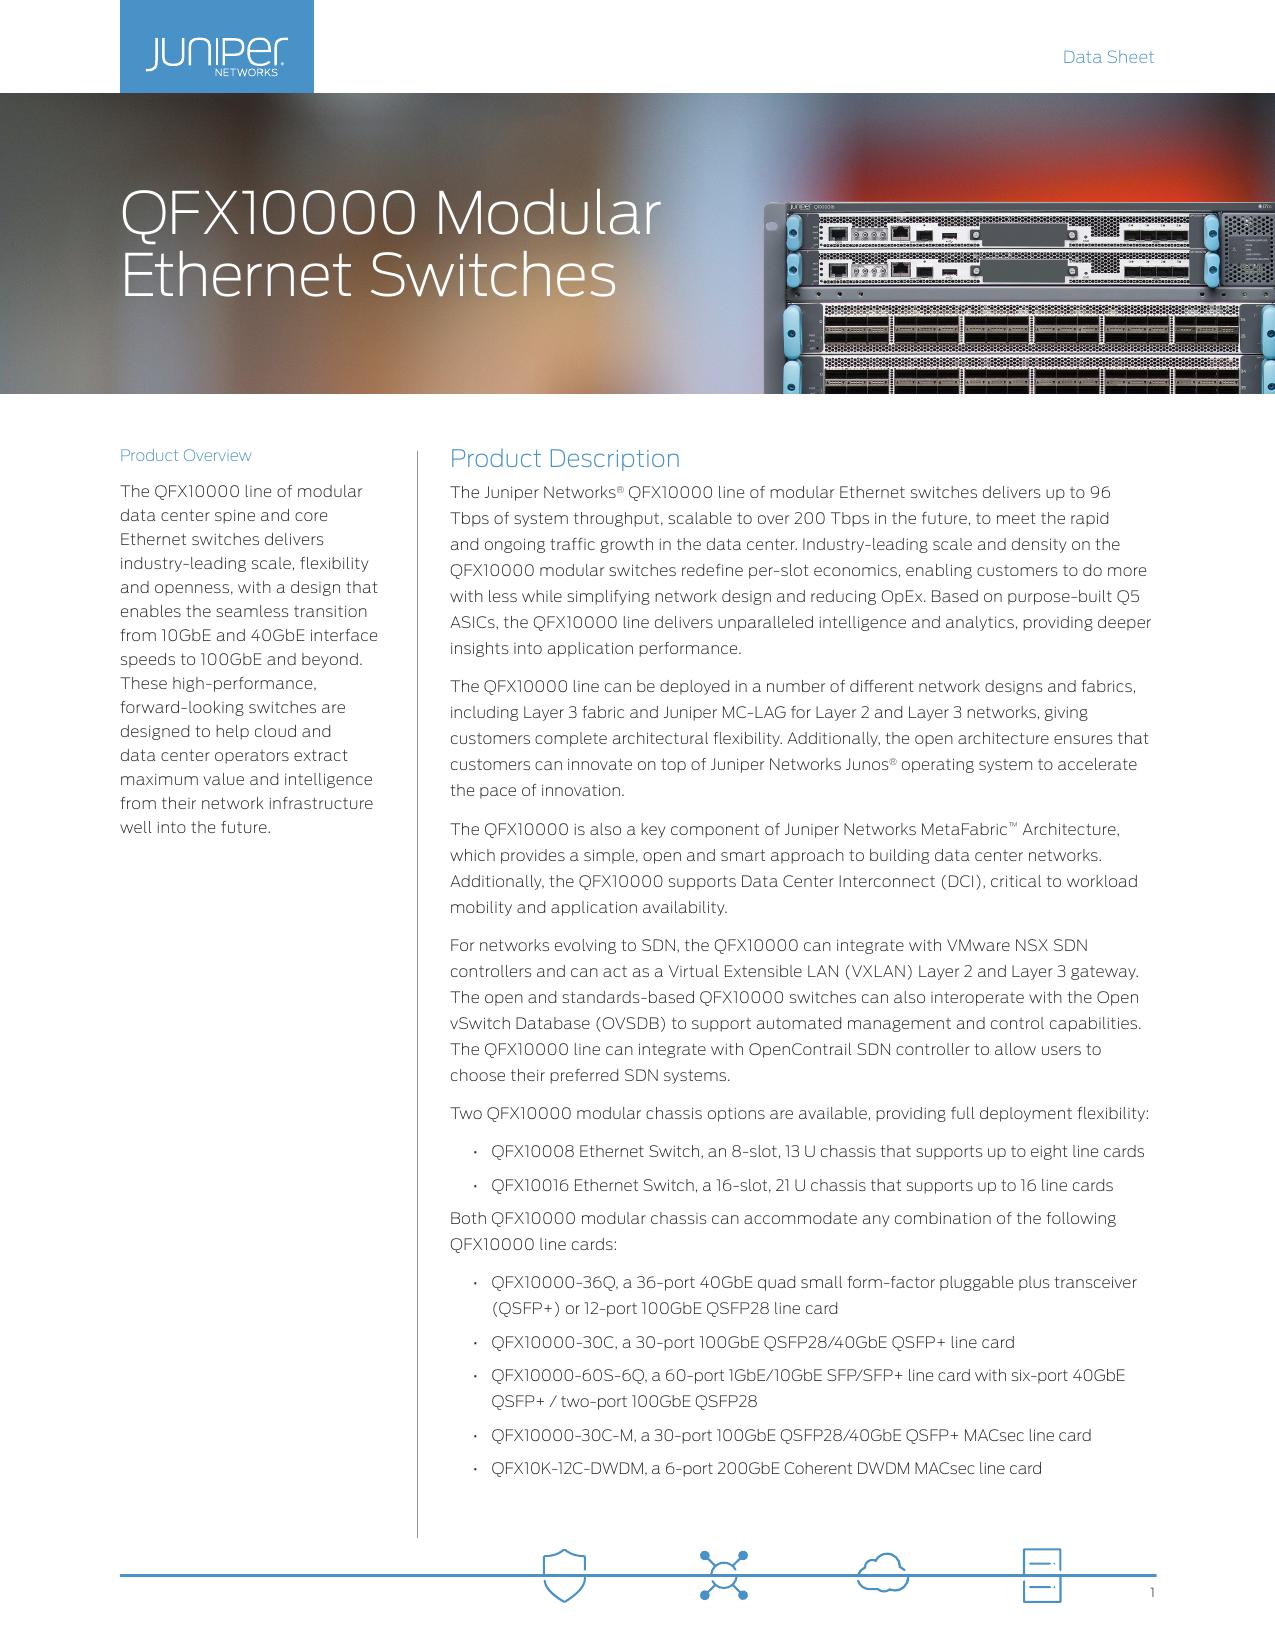 QFX10000 Modular Ethernet Switches | manualzz com